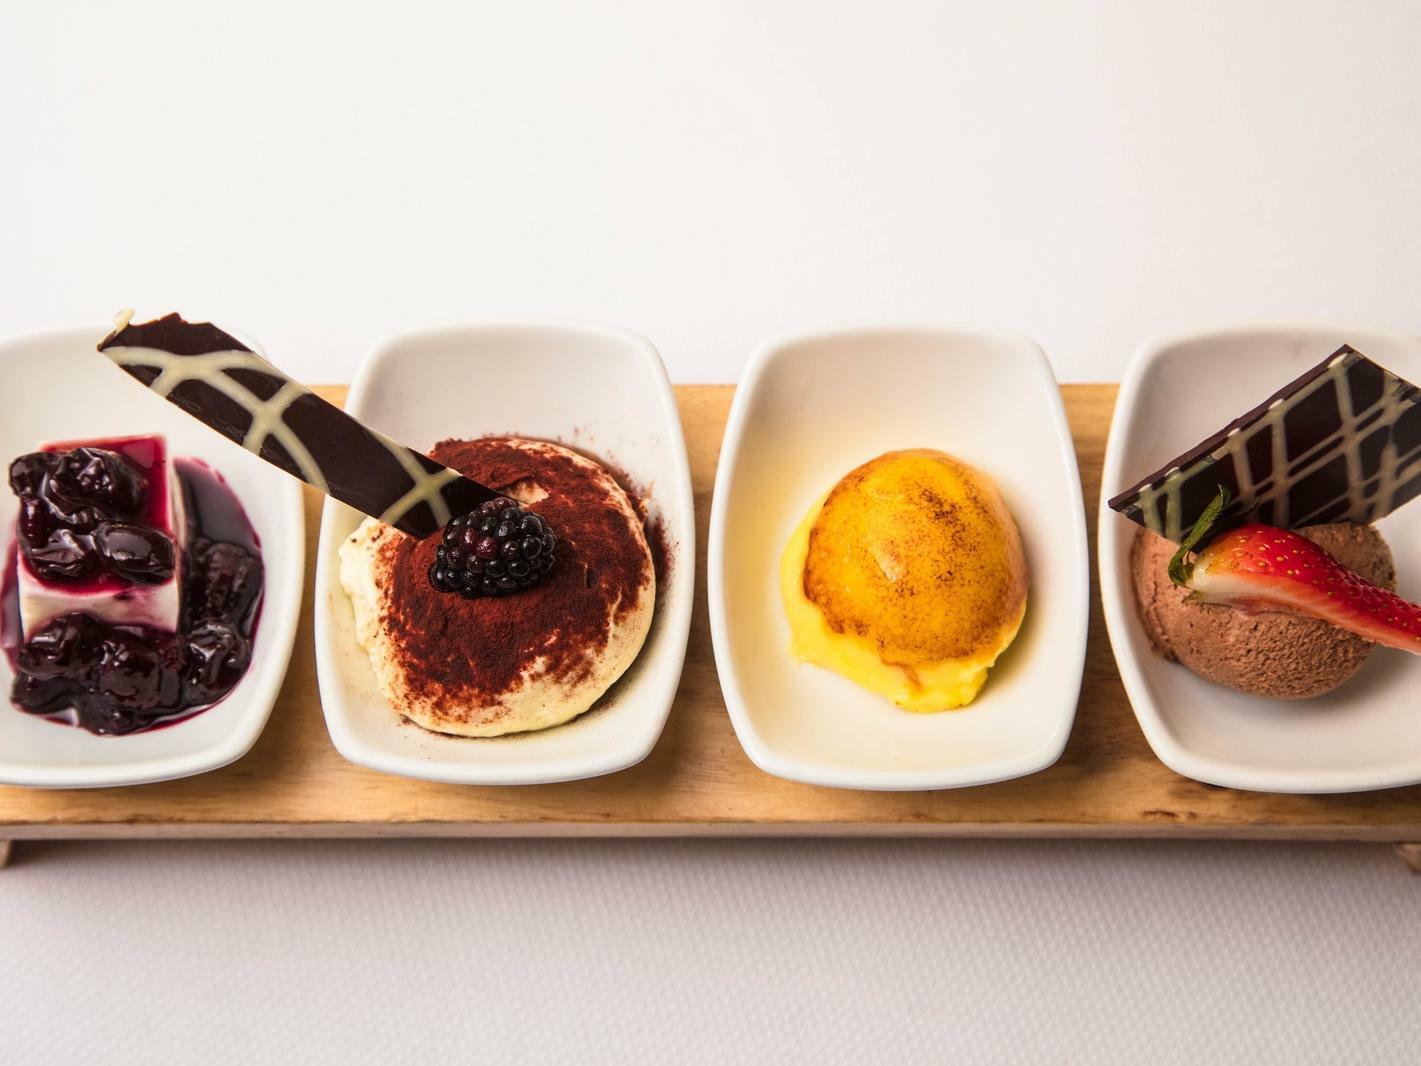 4 small dessert plates